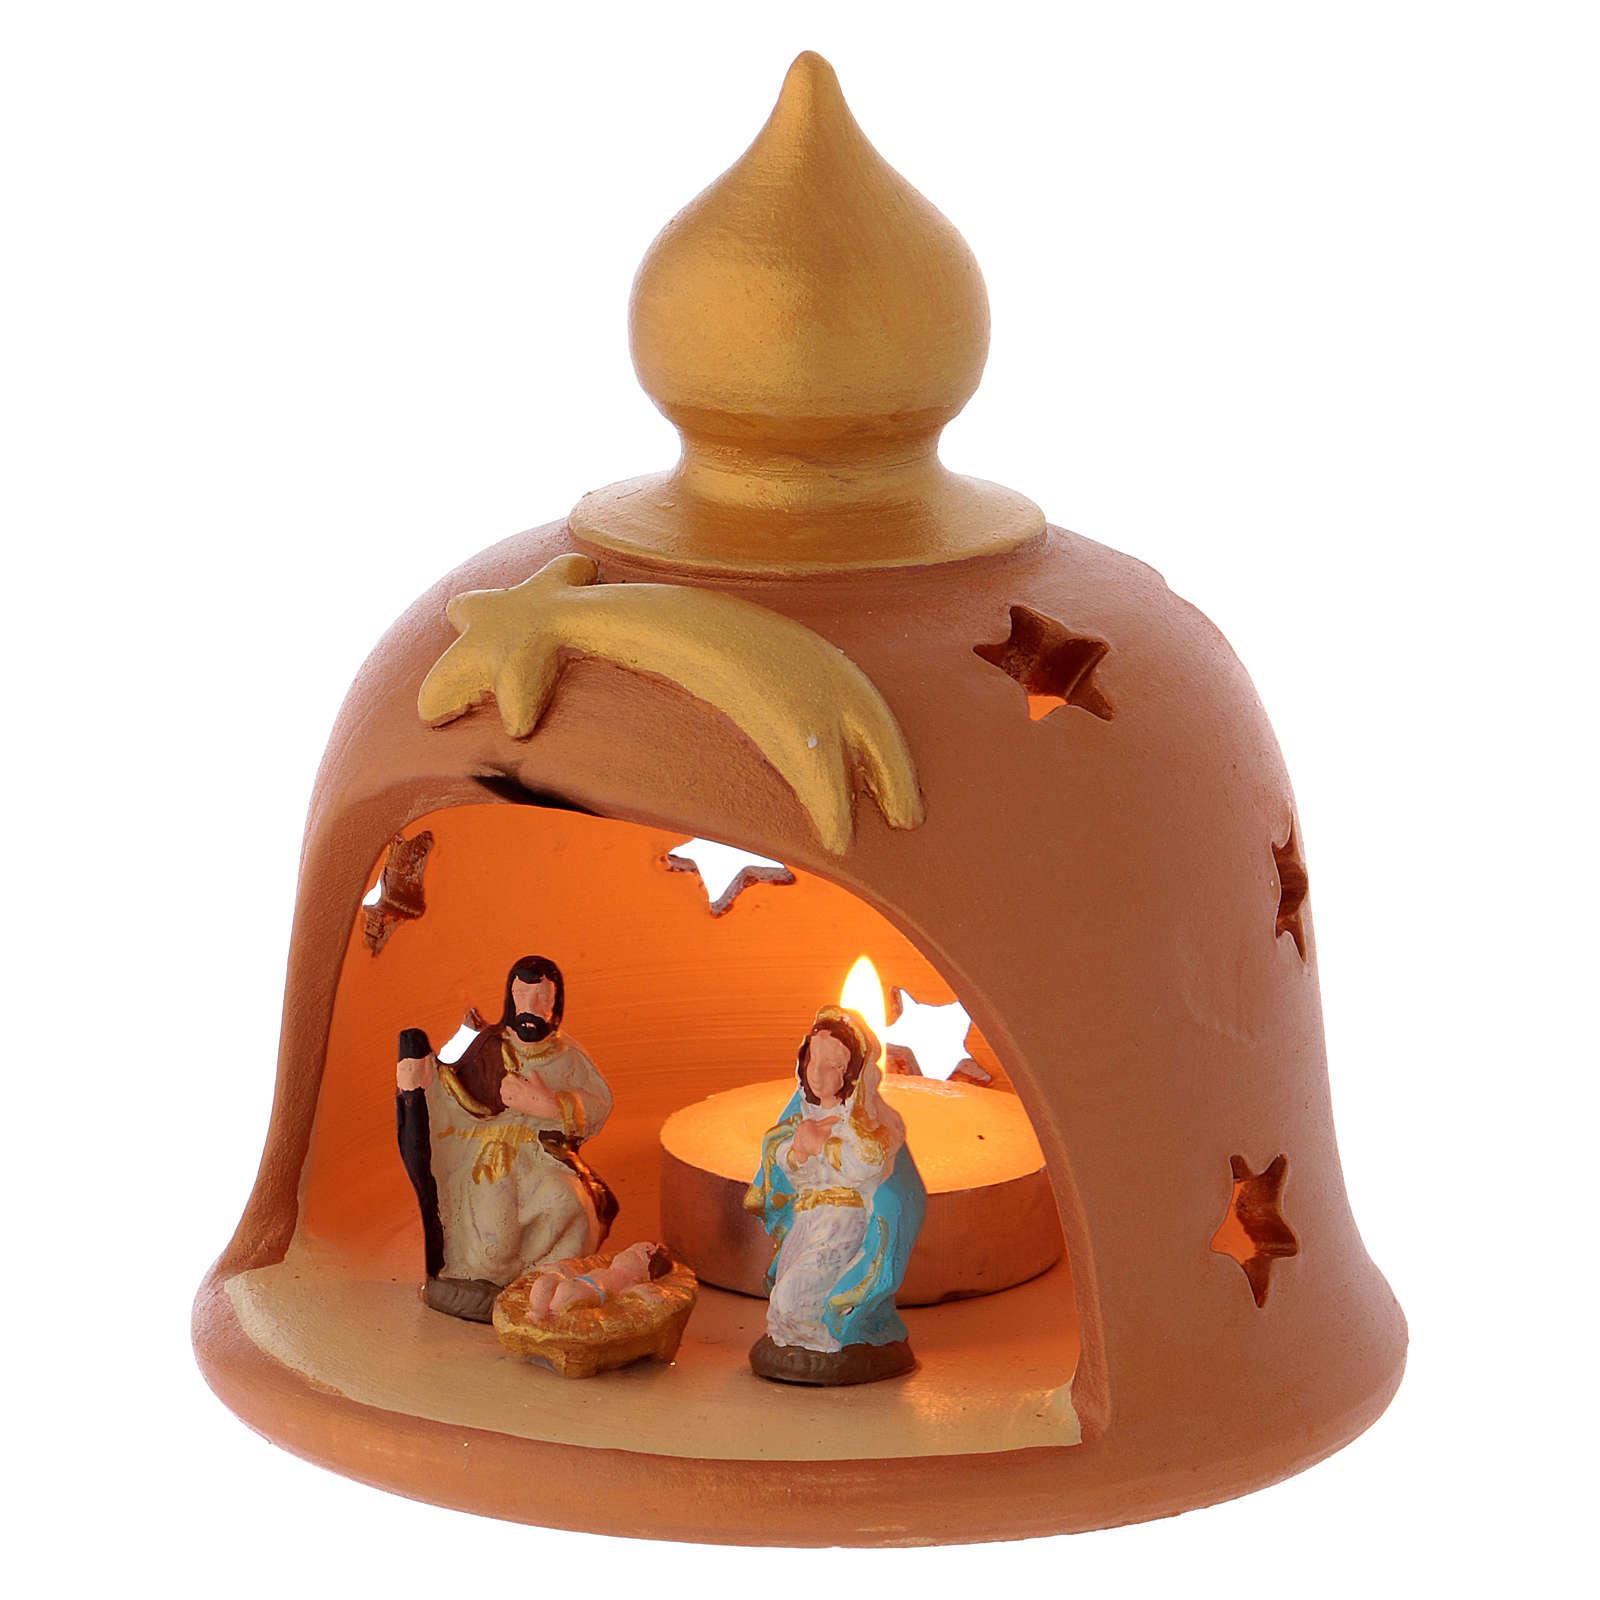 Capanna con lume decorata terracotta Deruta 10 cm 4